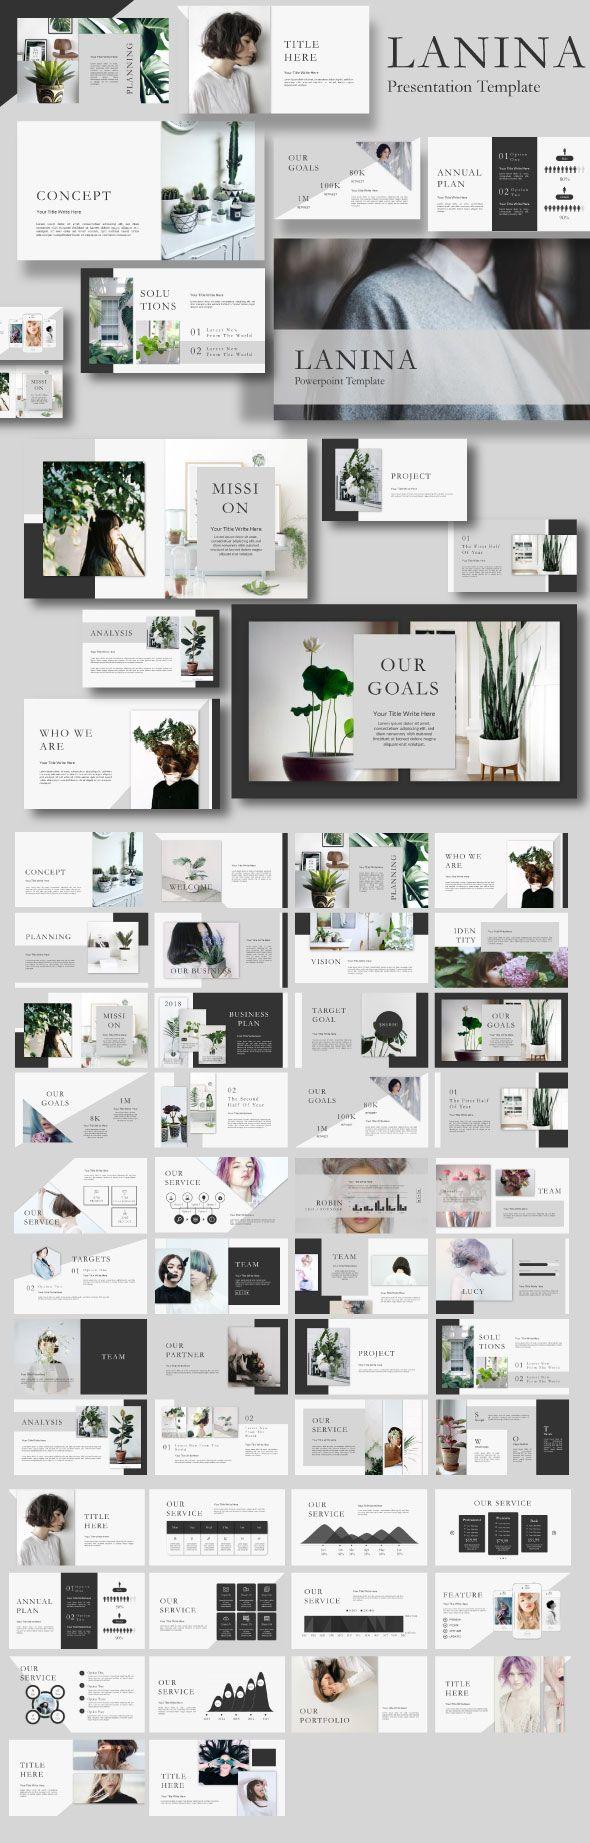 Business infographic : Lalina Google Slide Template - Google